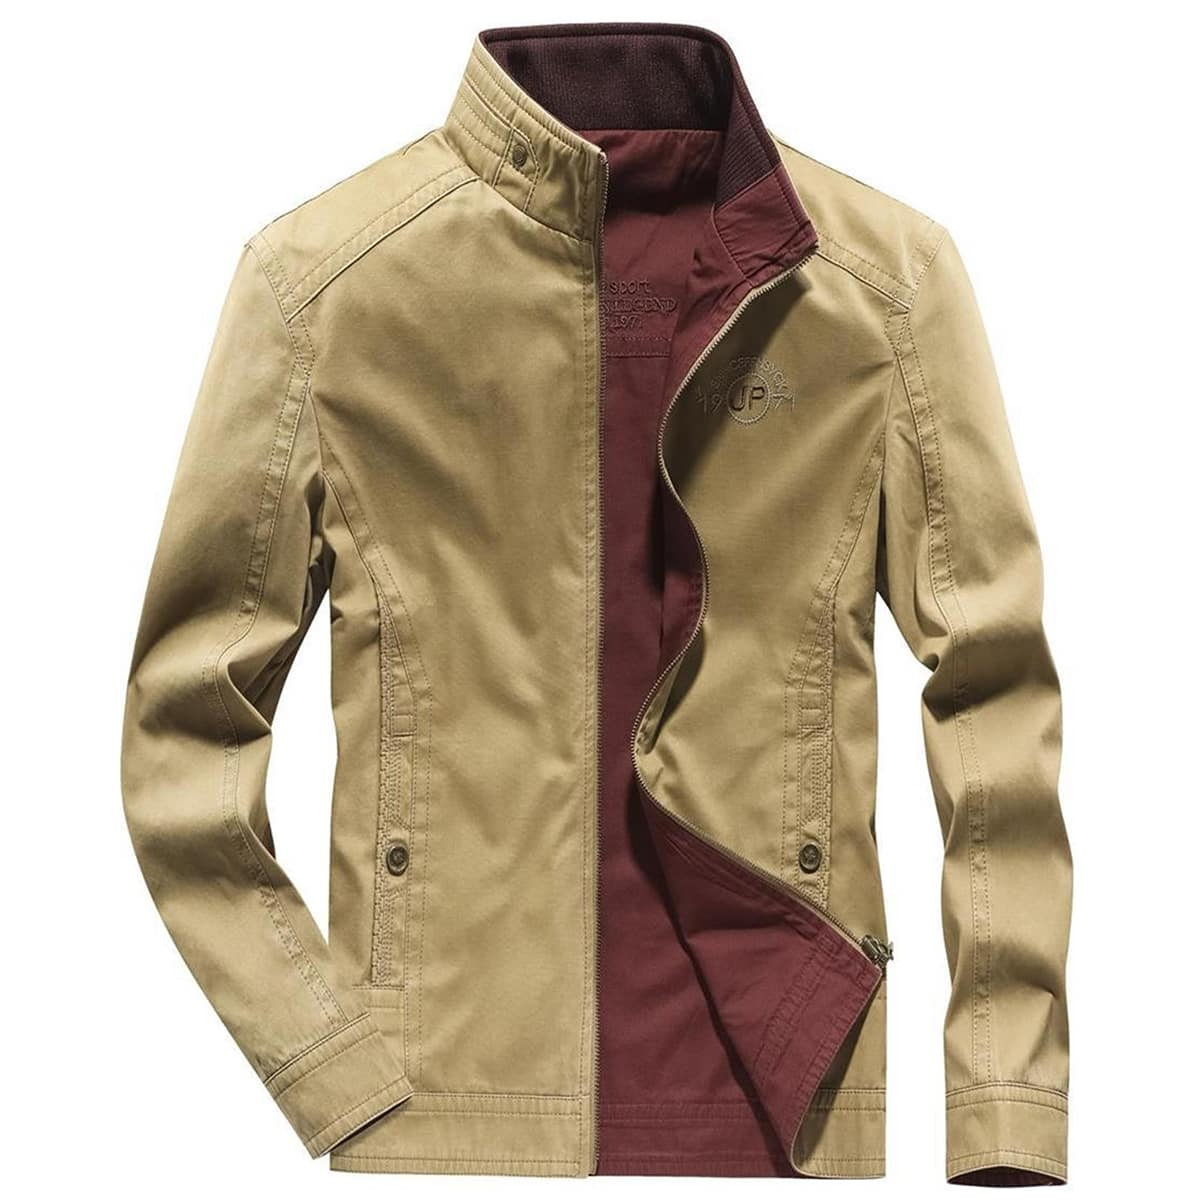 Мужская двусторонняя куртка с вышивкой